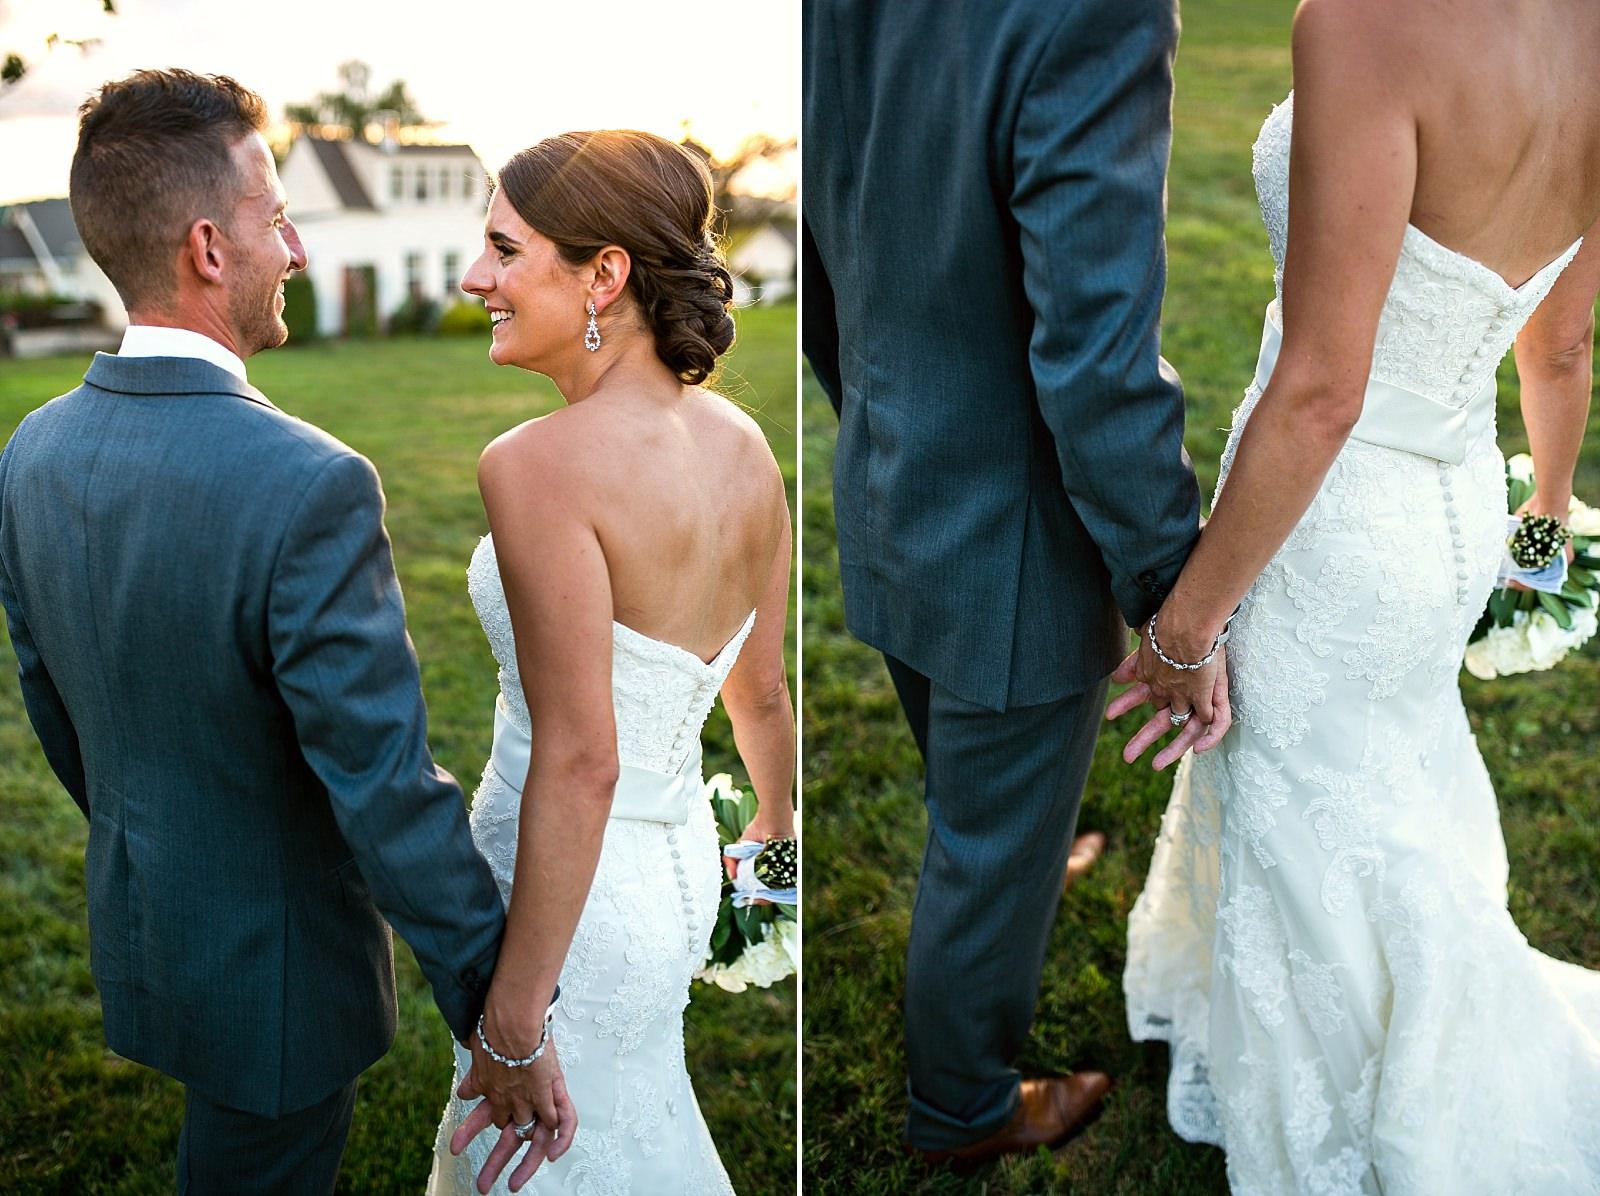 CT_Wedding_Photographer_LiNa_Wed_59.jpg